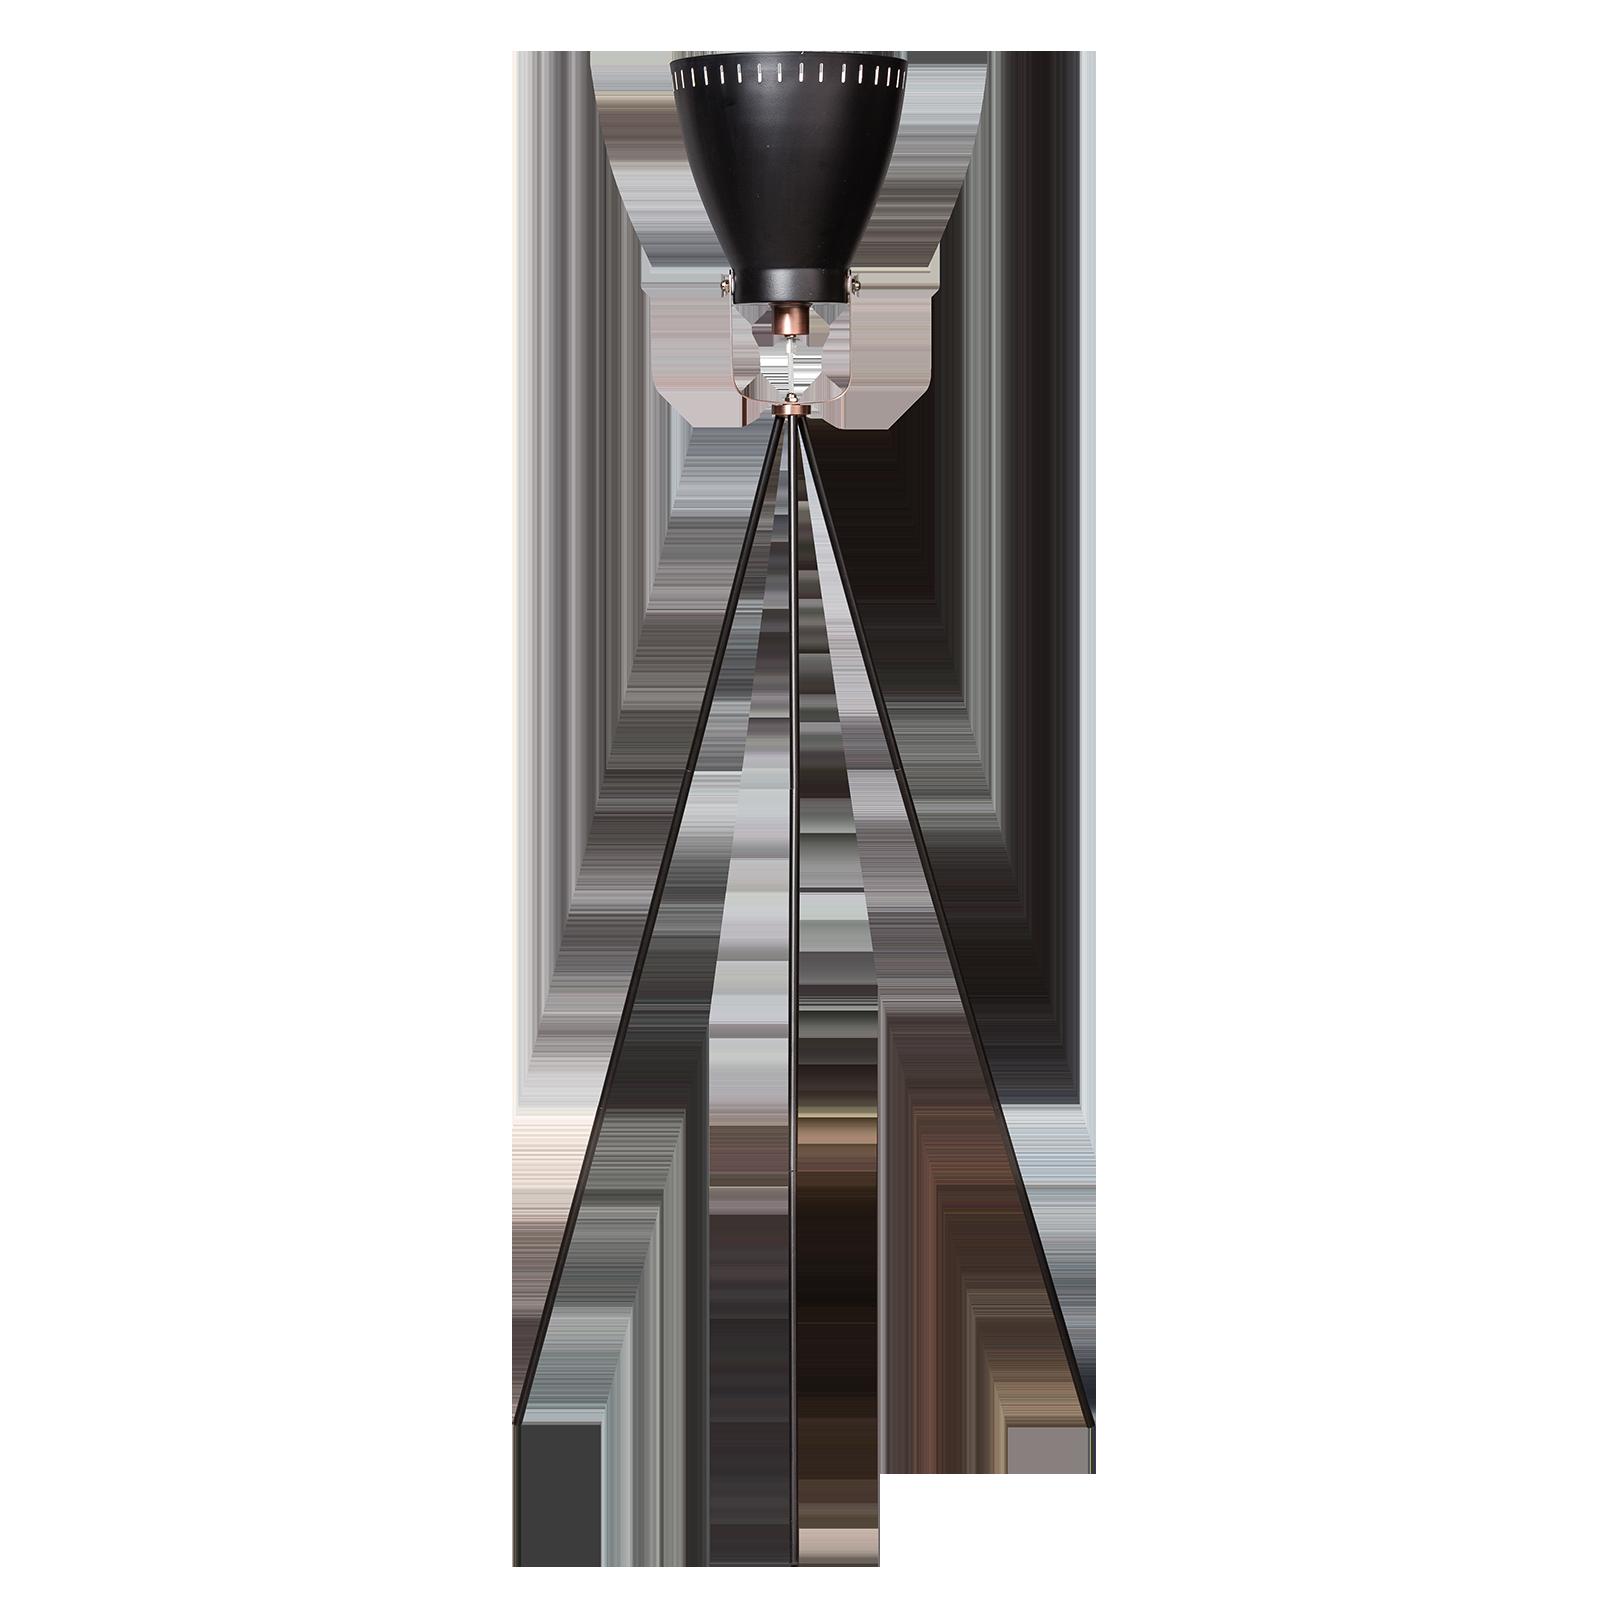 Acate vloerlamp ETH driepoot zwart/koper